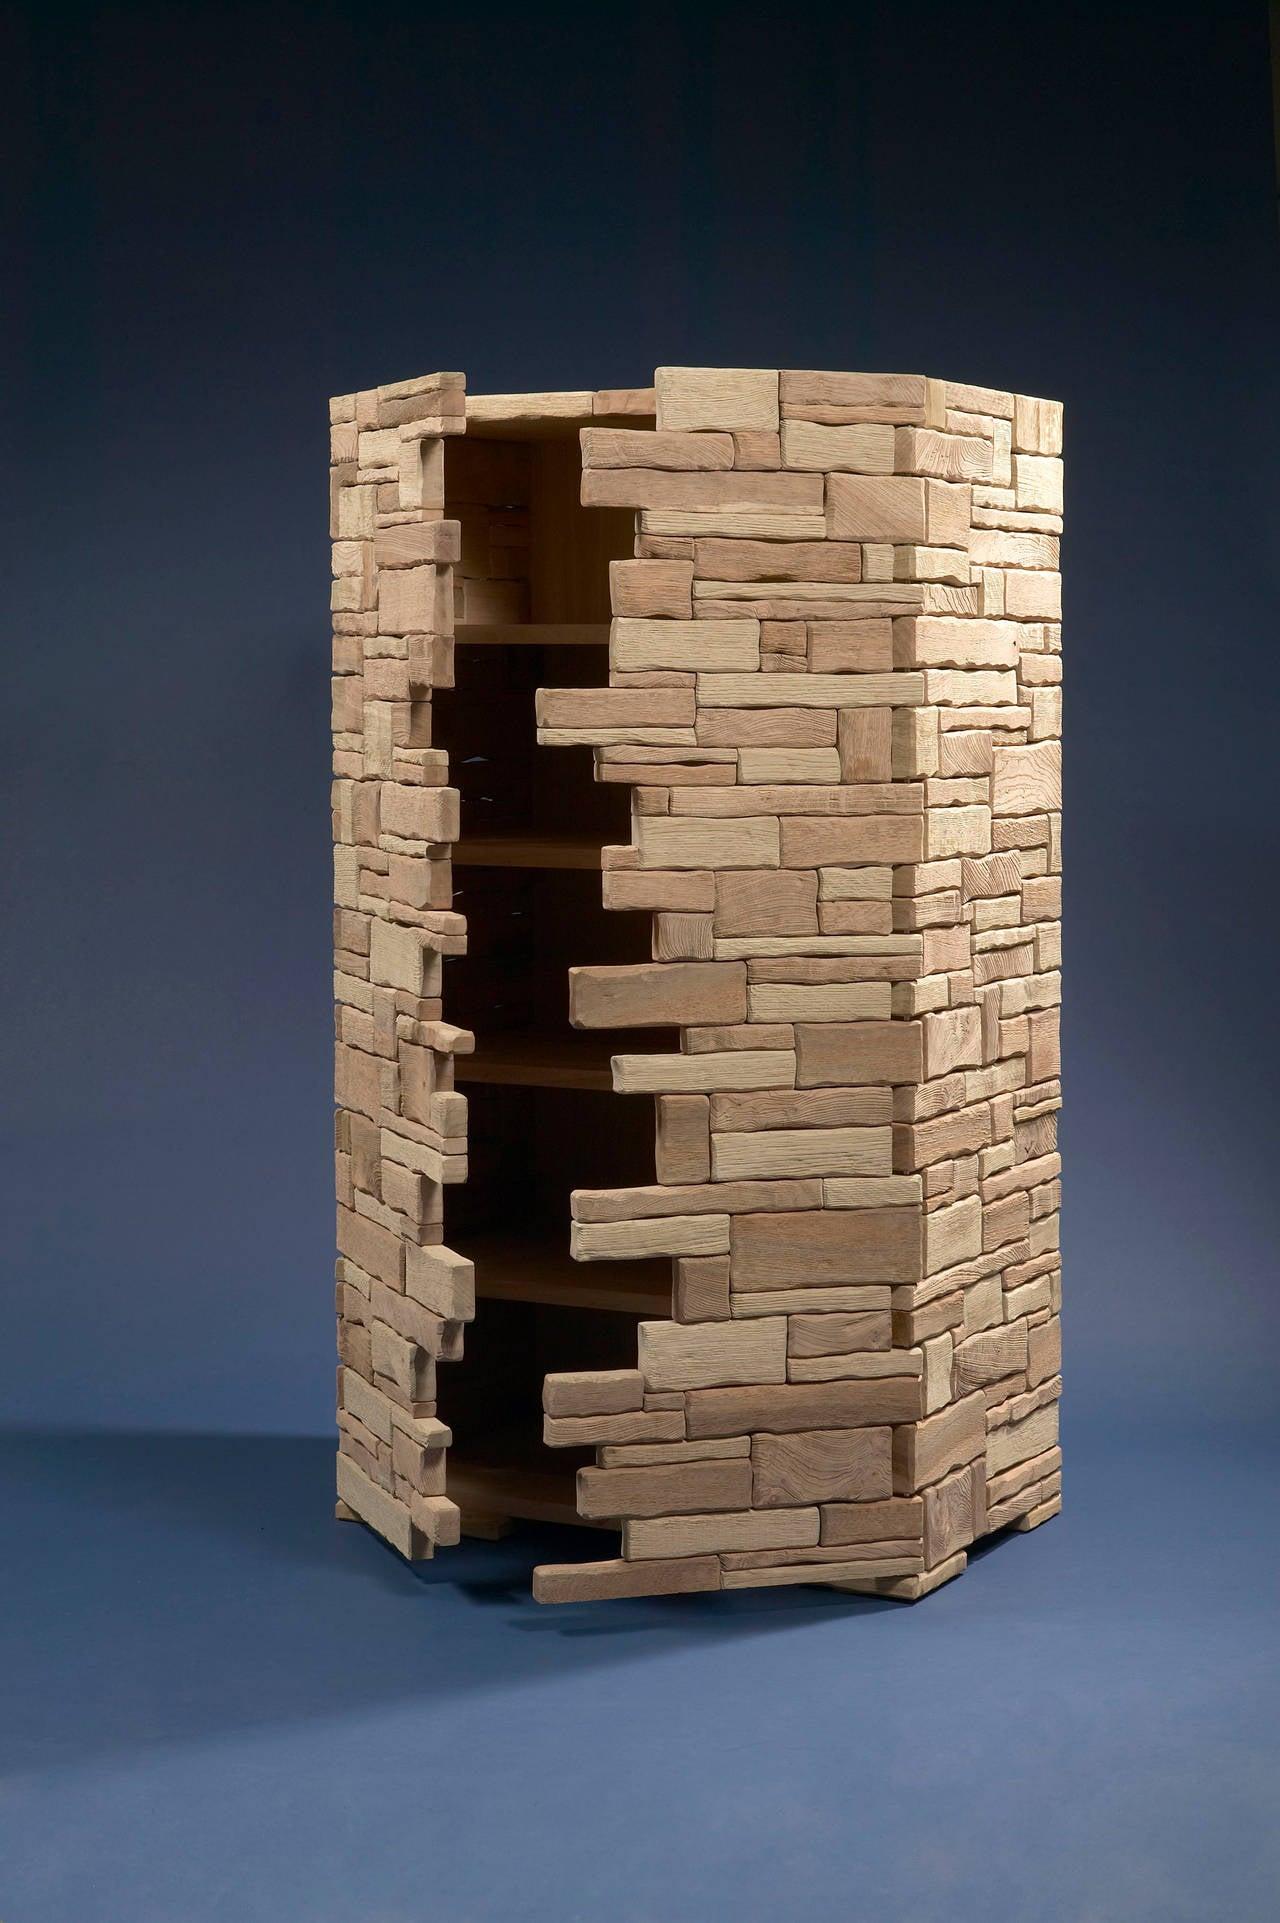 Mur. Cat-Berro Edition, 2006 Large storage unit. Carved oak and elm tree wood. Two doors, four shelves.  Measures: H 70.5